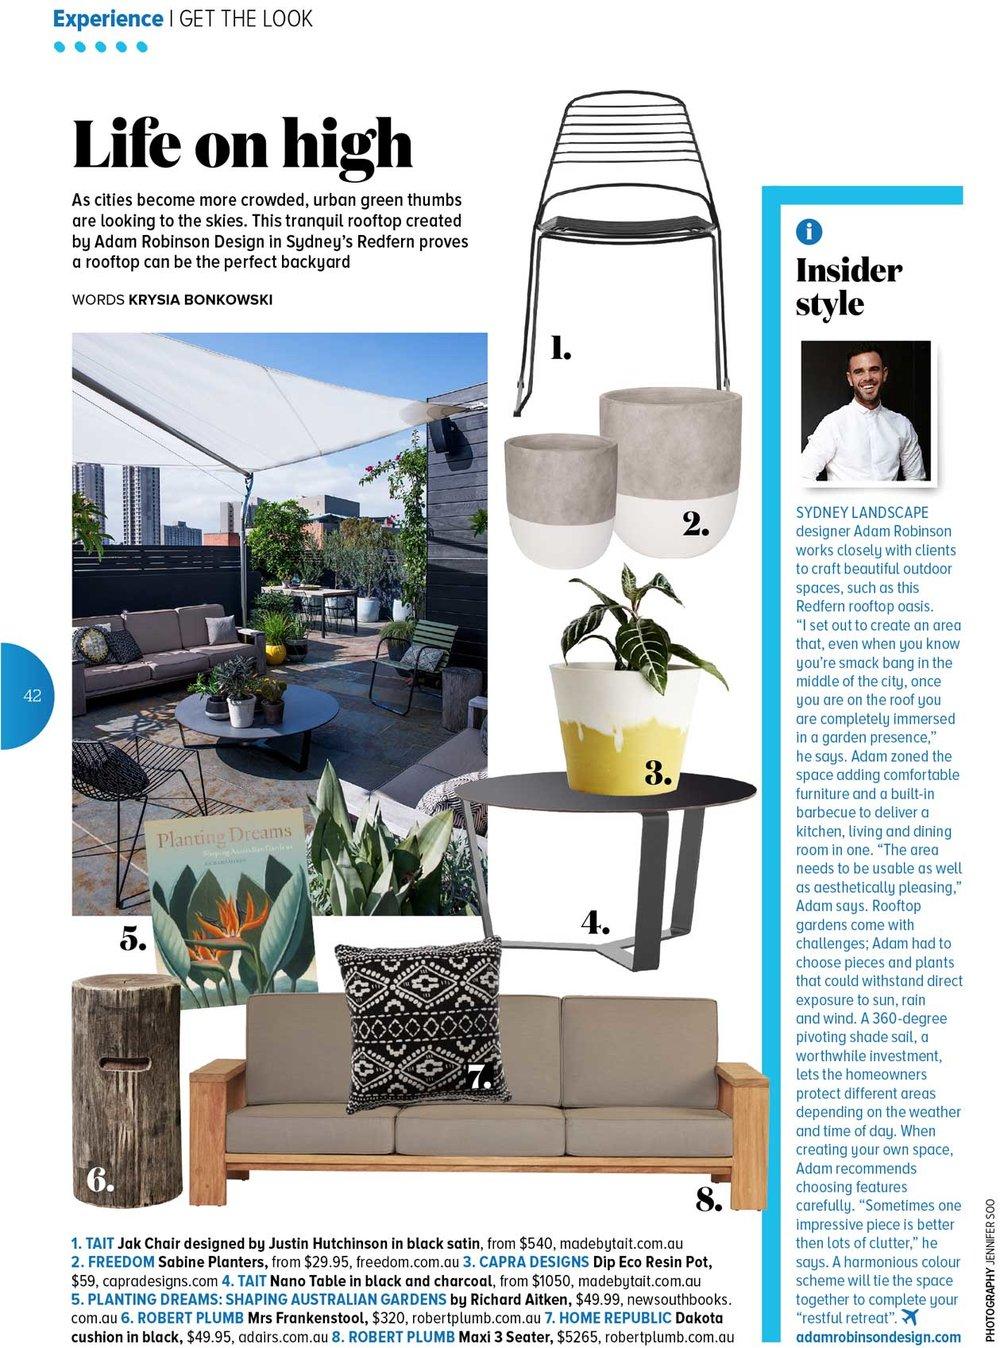 Jetstar magazine, December 2016